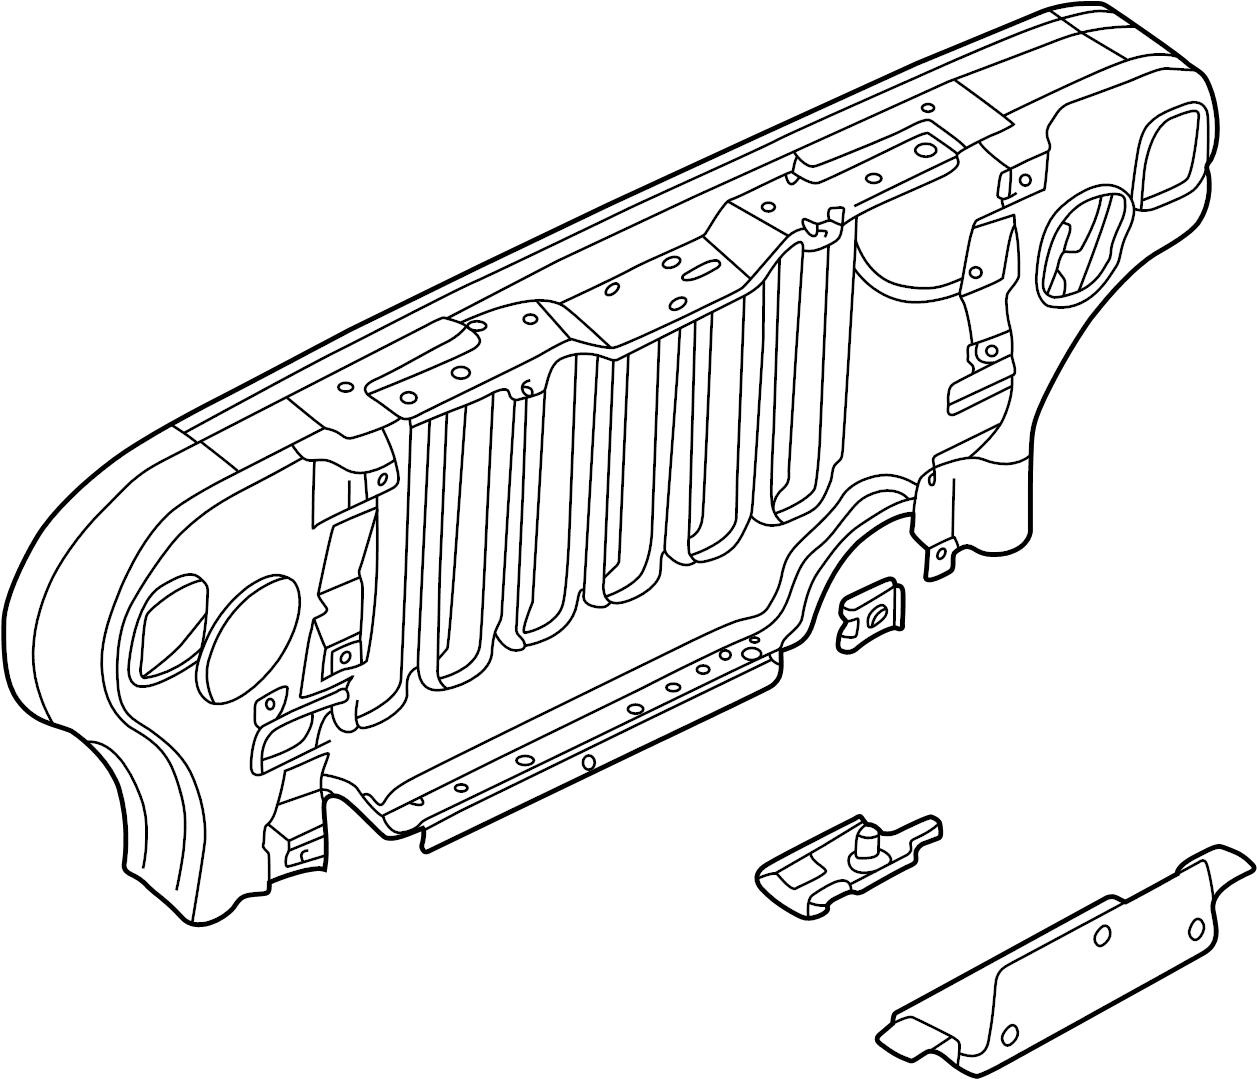 Panel Radiator Closure For Jeep Wrangler